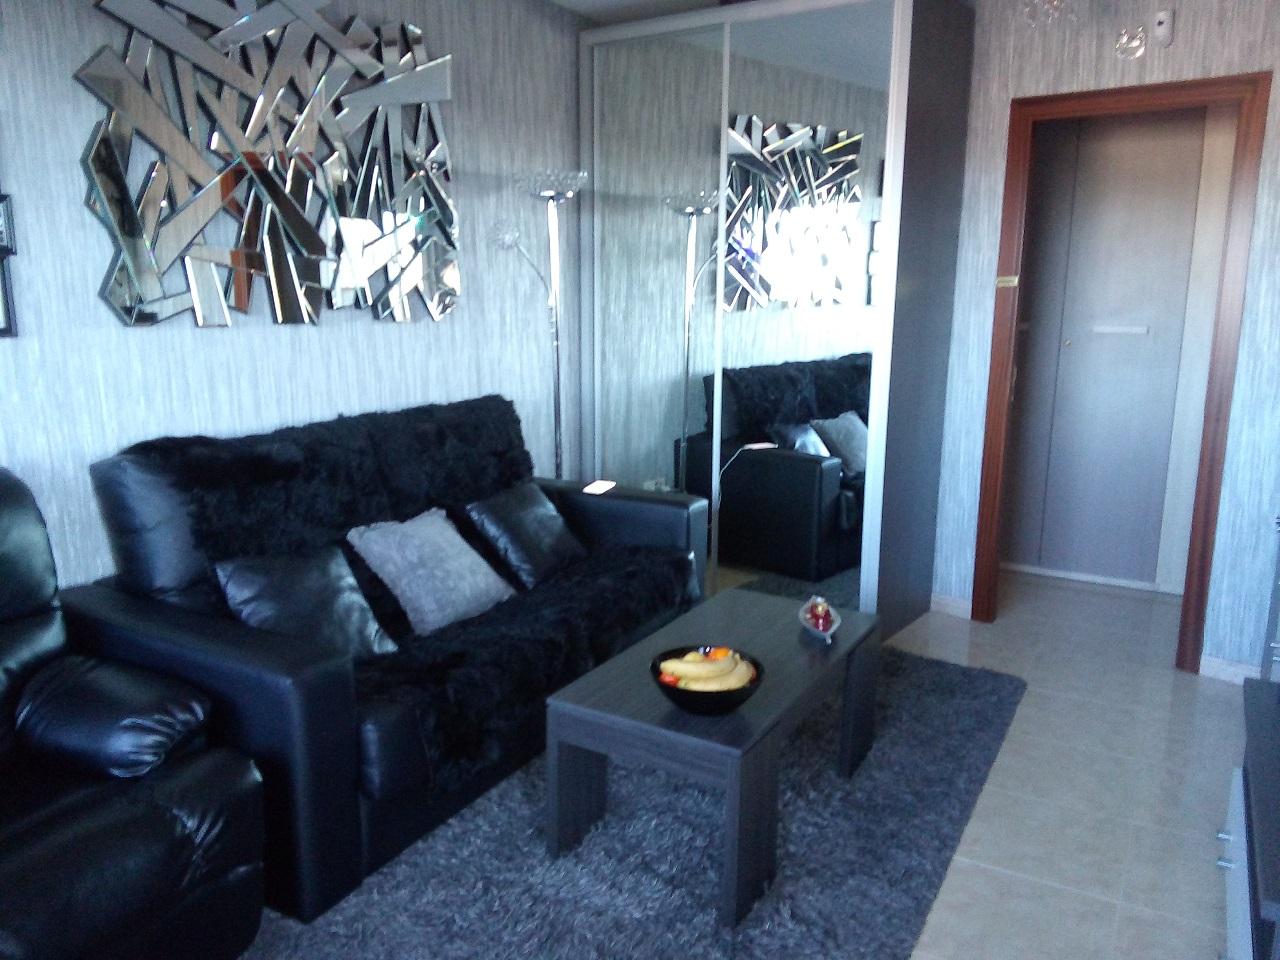 Appartamento  La montañeta vendrell, el. Agc0719. espectacular piso en buena zona, a 2 minutos del centro